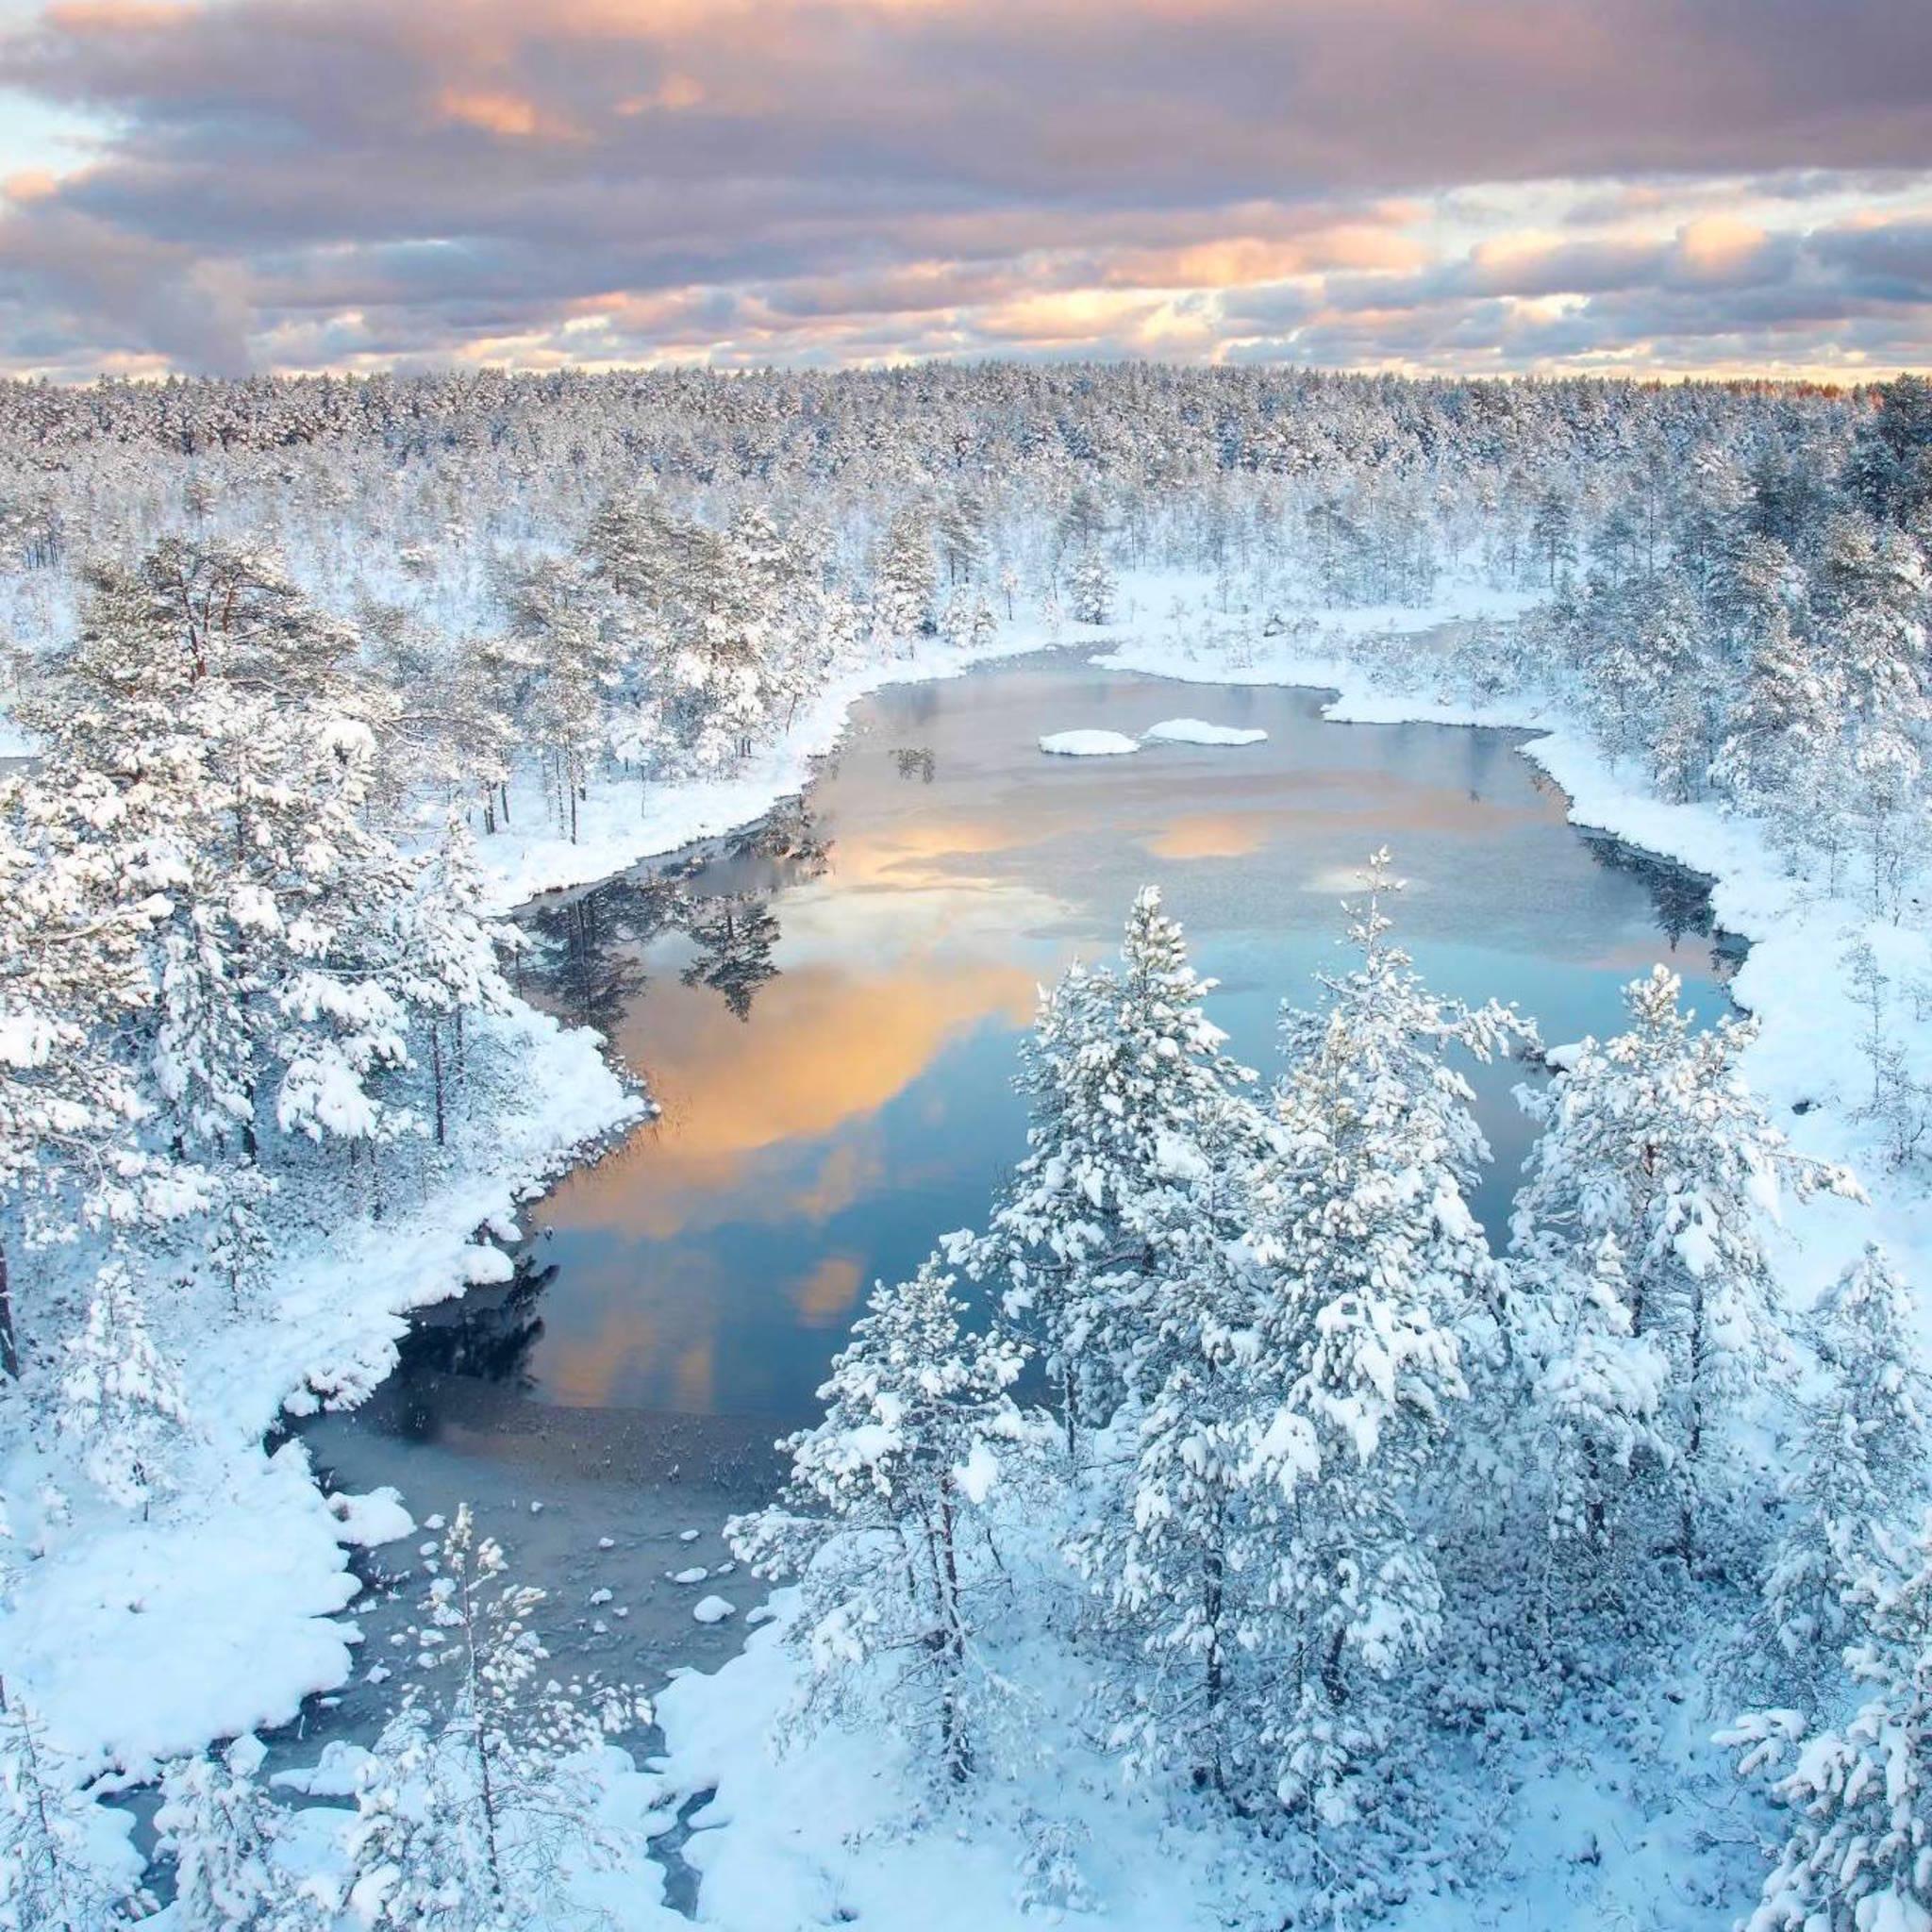 Winter Wonderland   Photo by Jan Lepamaa http://t.co/XhBFRjtKFP